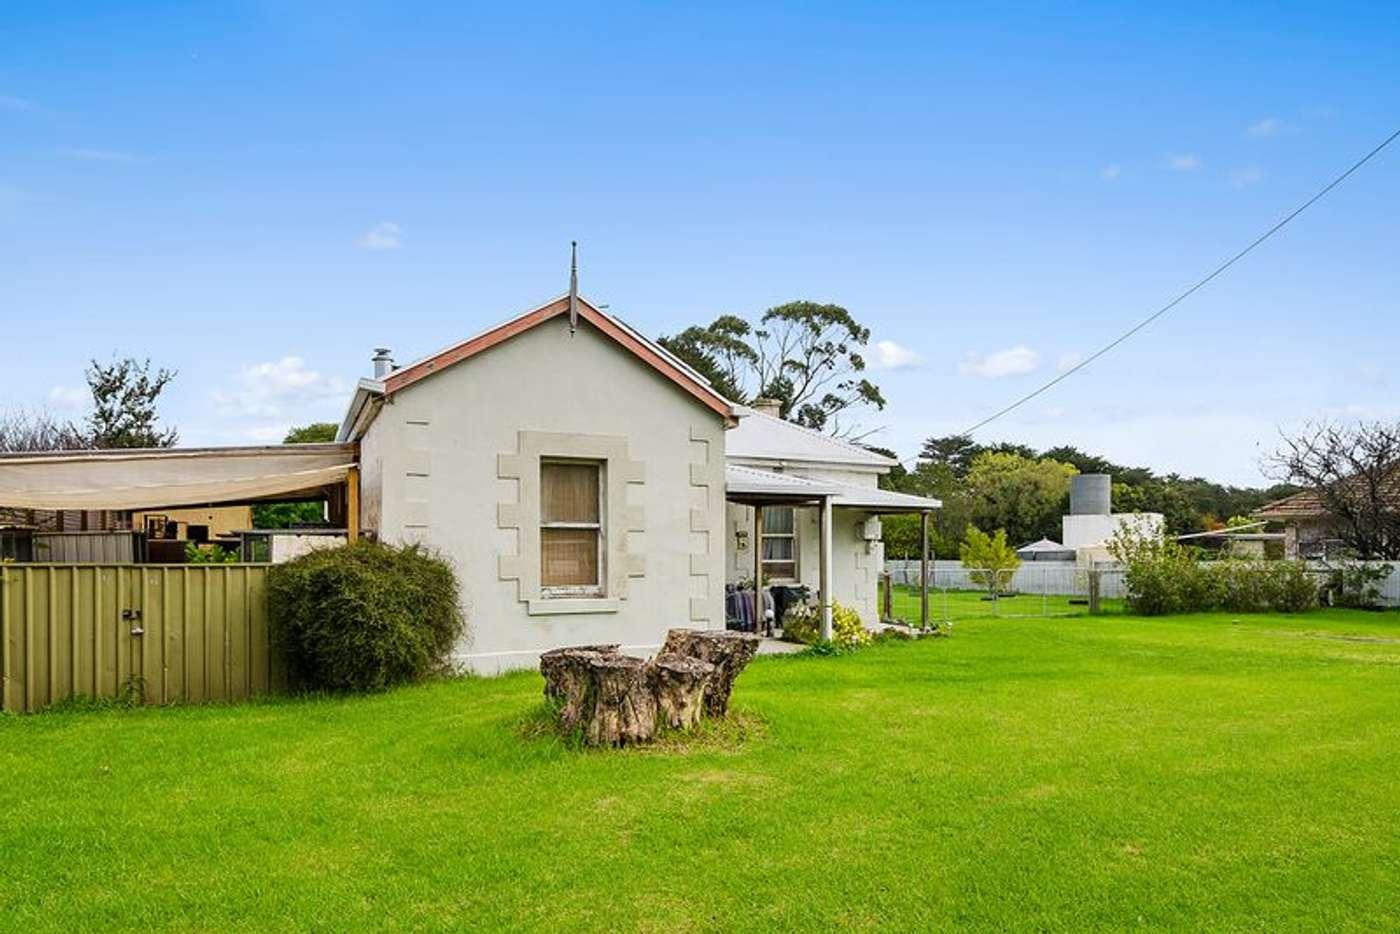 Main view of Homely house listing, 10-12 Randall Street, Tantanoola SA 5280